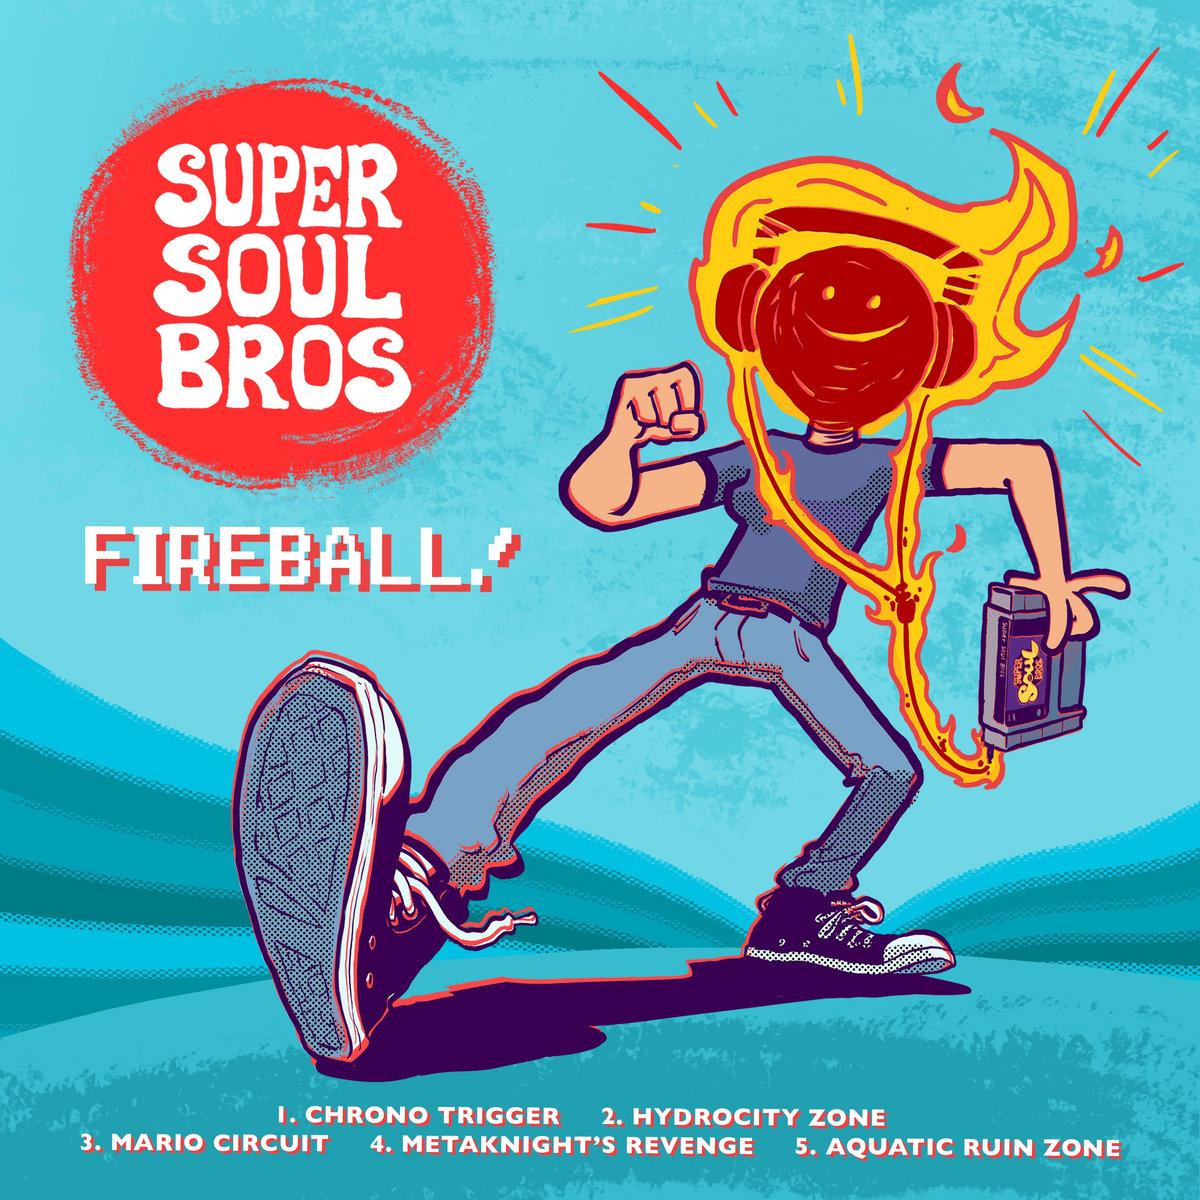 Fireball! | Super Soul Bros.